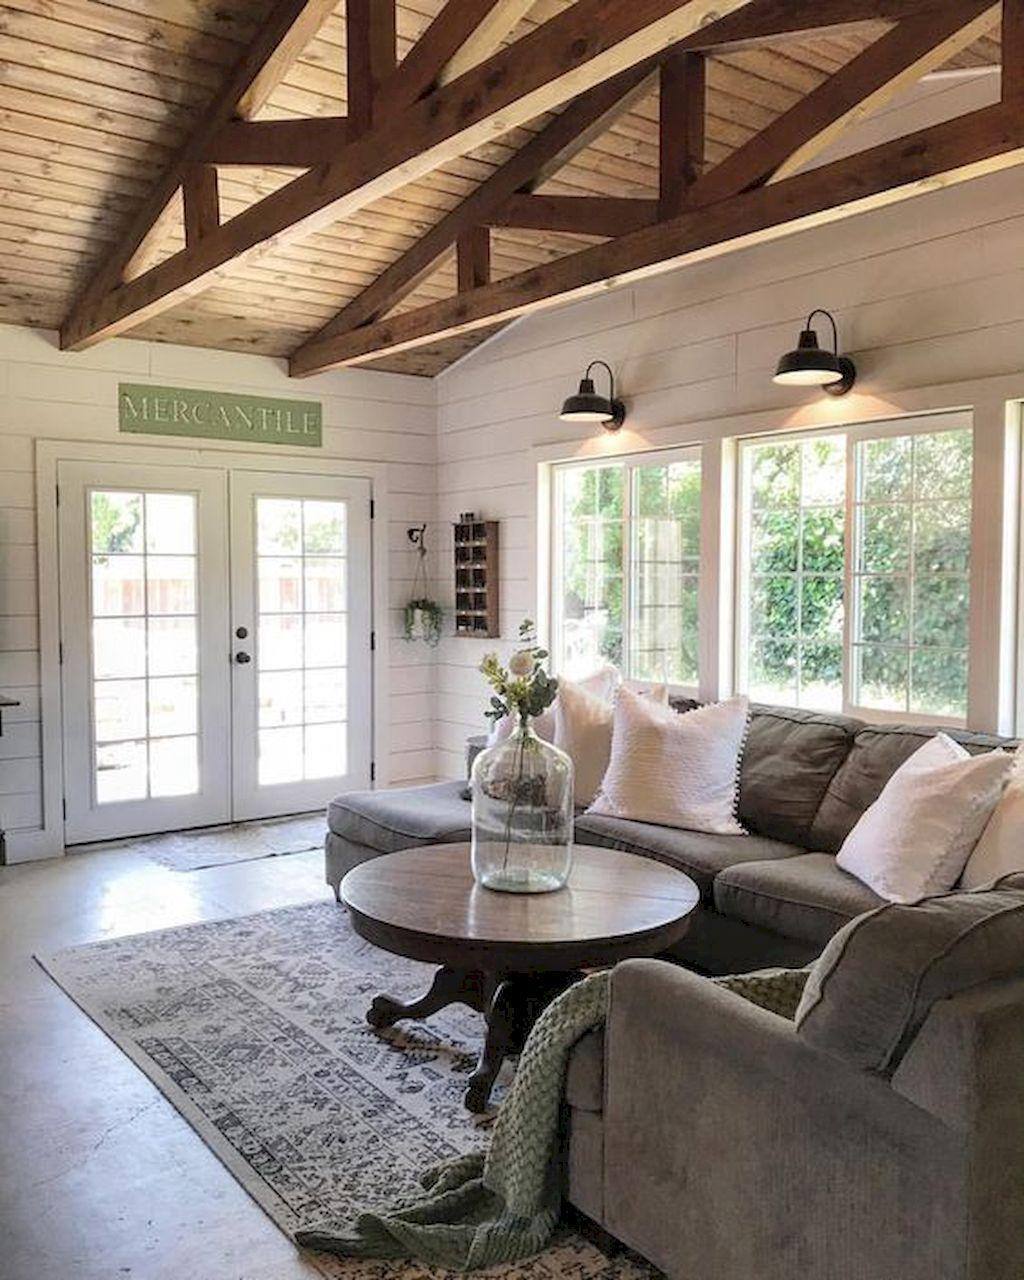 80 Modern Farmhouse Staircase Decor Ideas 64: 80 Cozy Rustic Farmhouse Living Room Remodel And Design